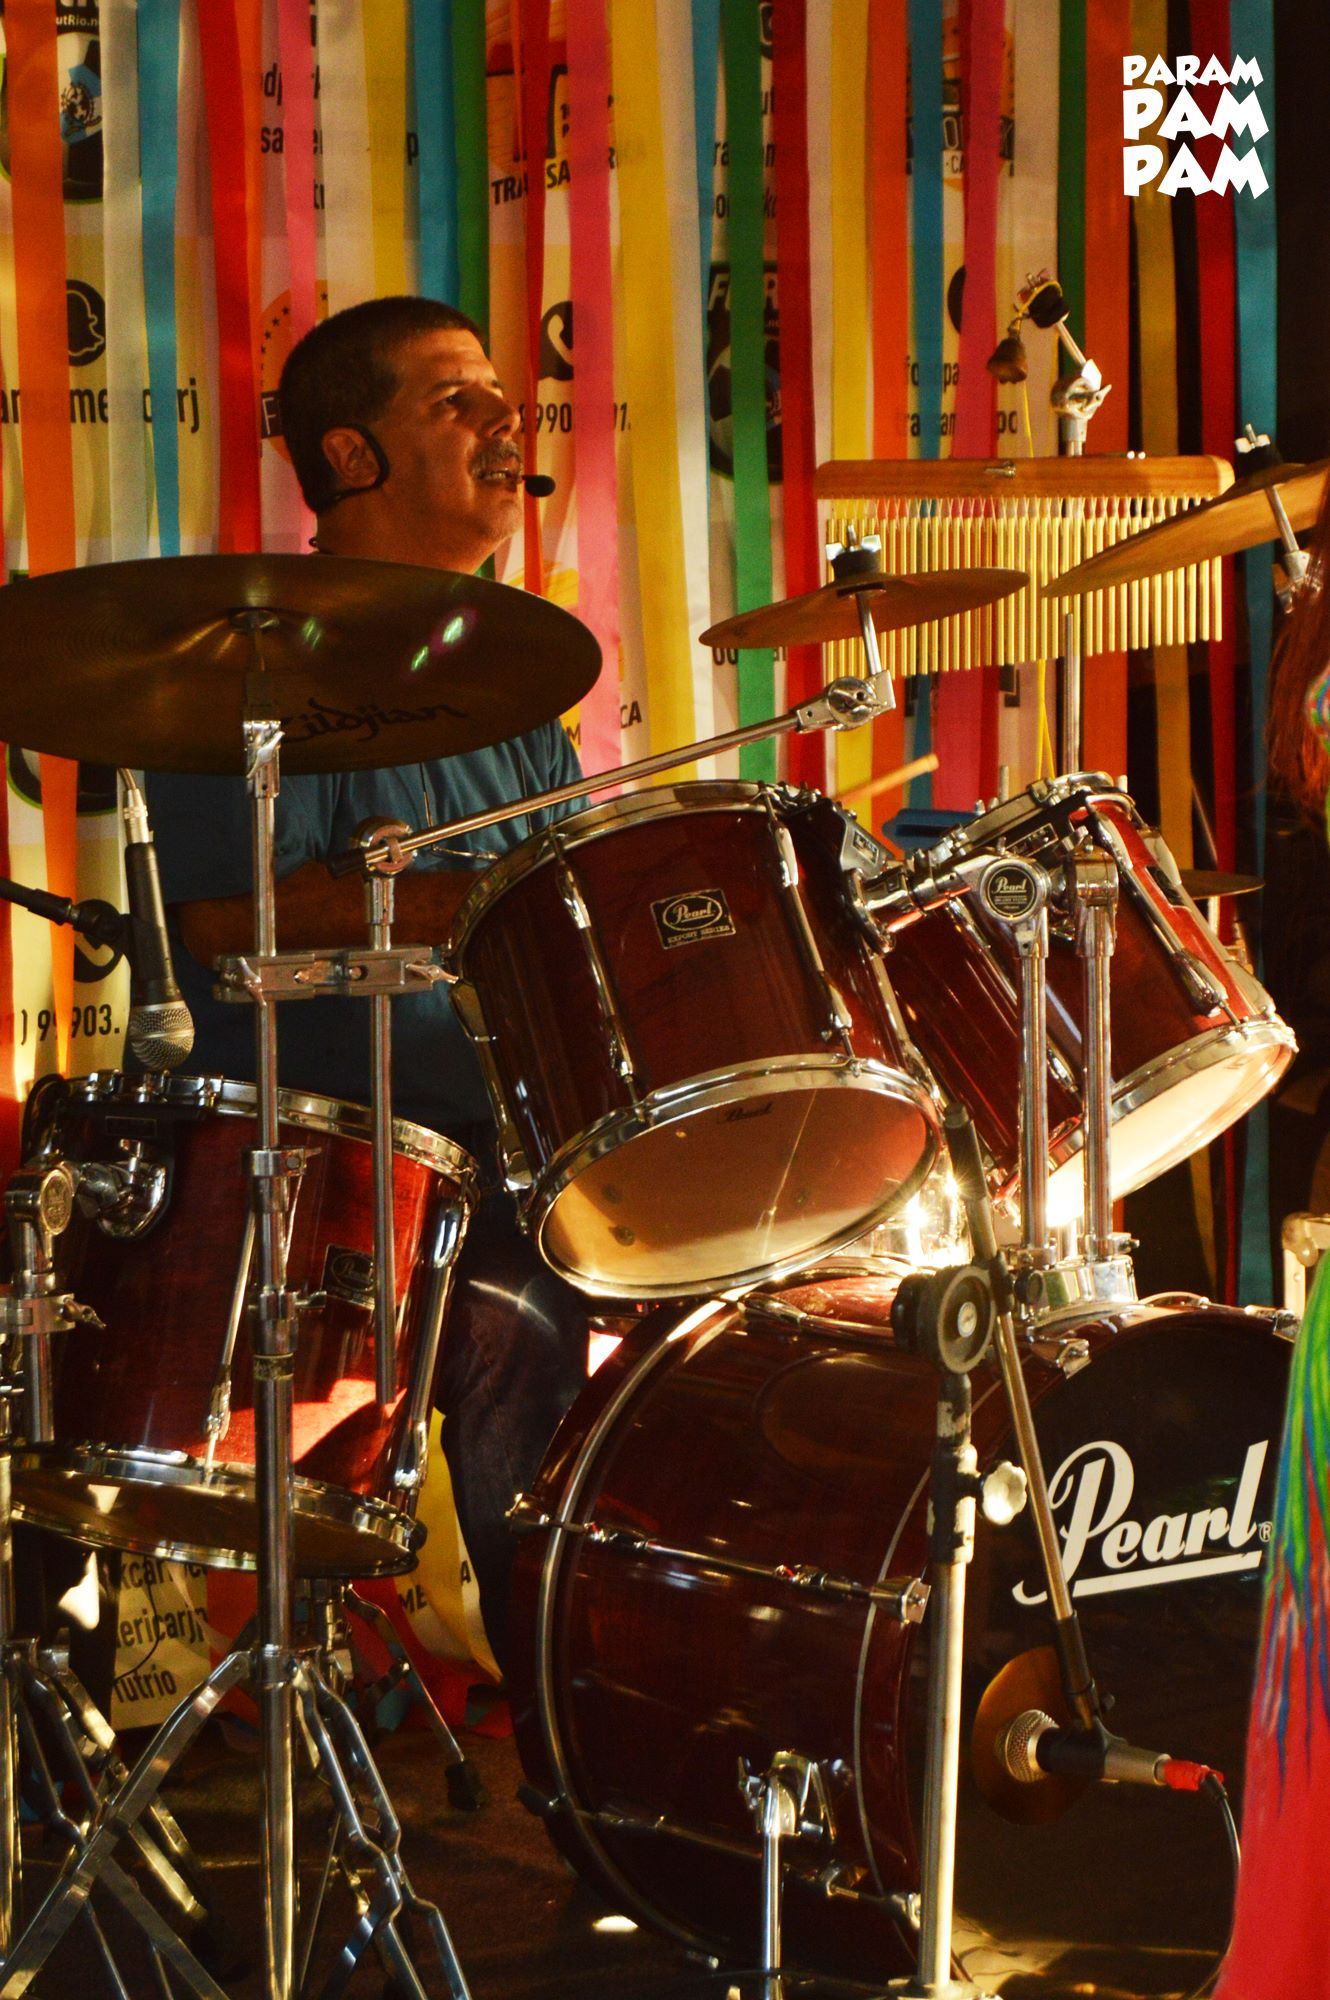 carnaval pppam_07